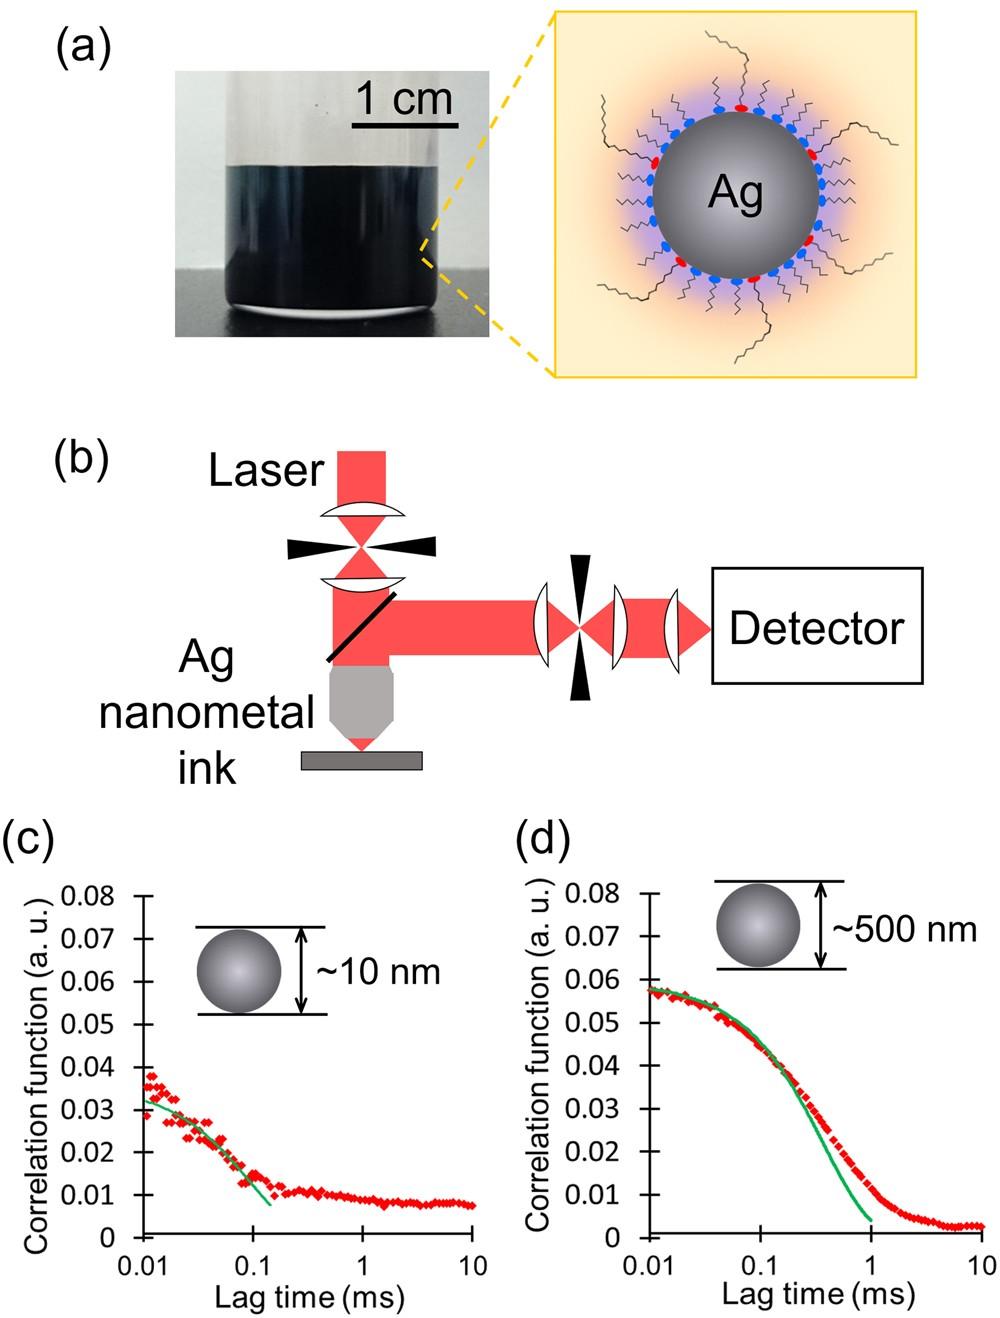 Unique Coexistence Of Dispersion Stability And Nanoparticle Pacific Scientific Wiring Diagram Chemisorption In Alkylamine Alkylacid Encapsulated Silver Nanocolloids Reports